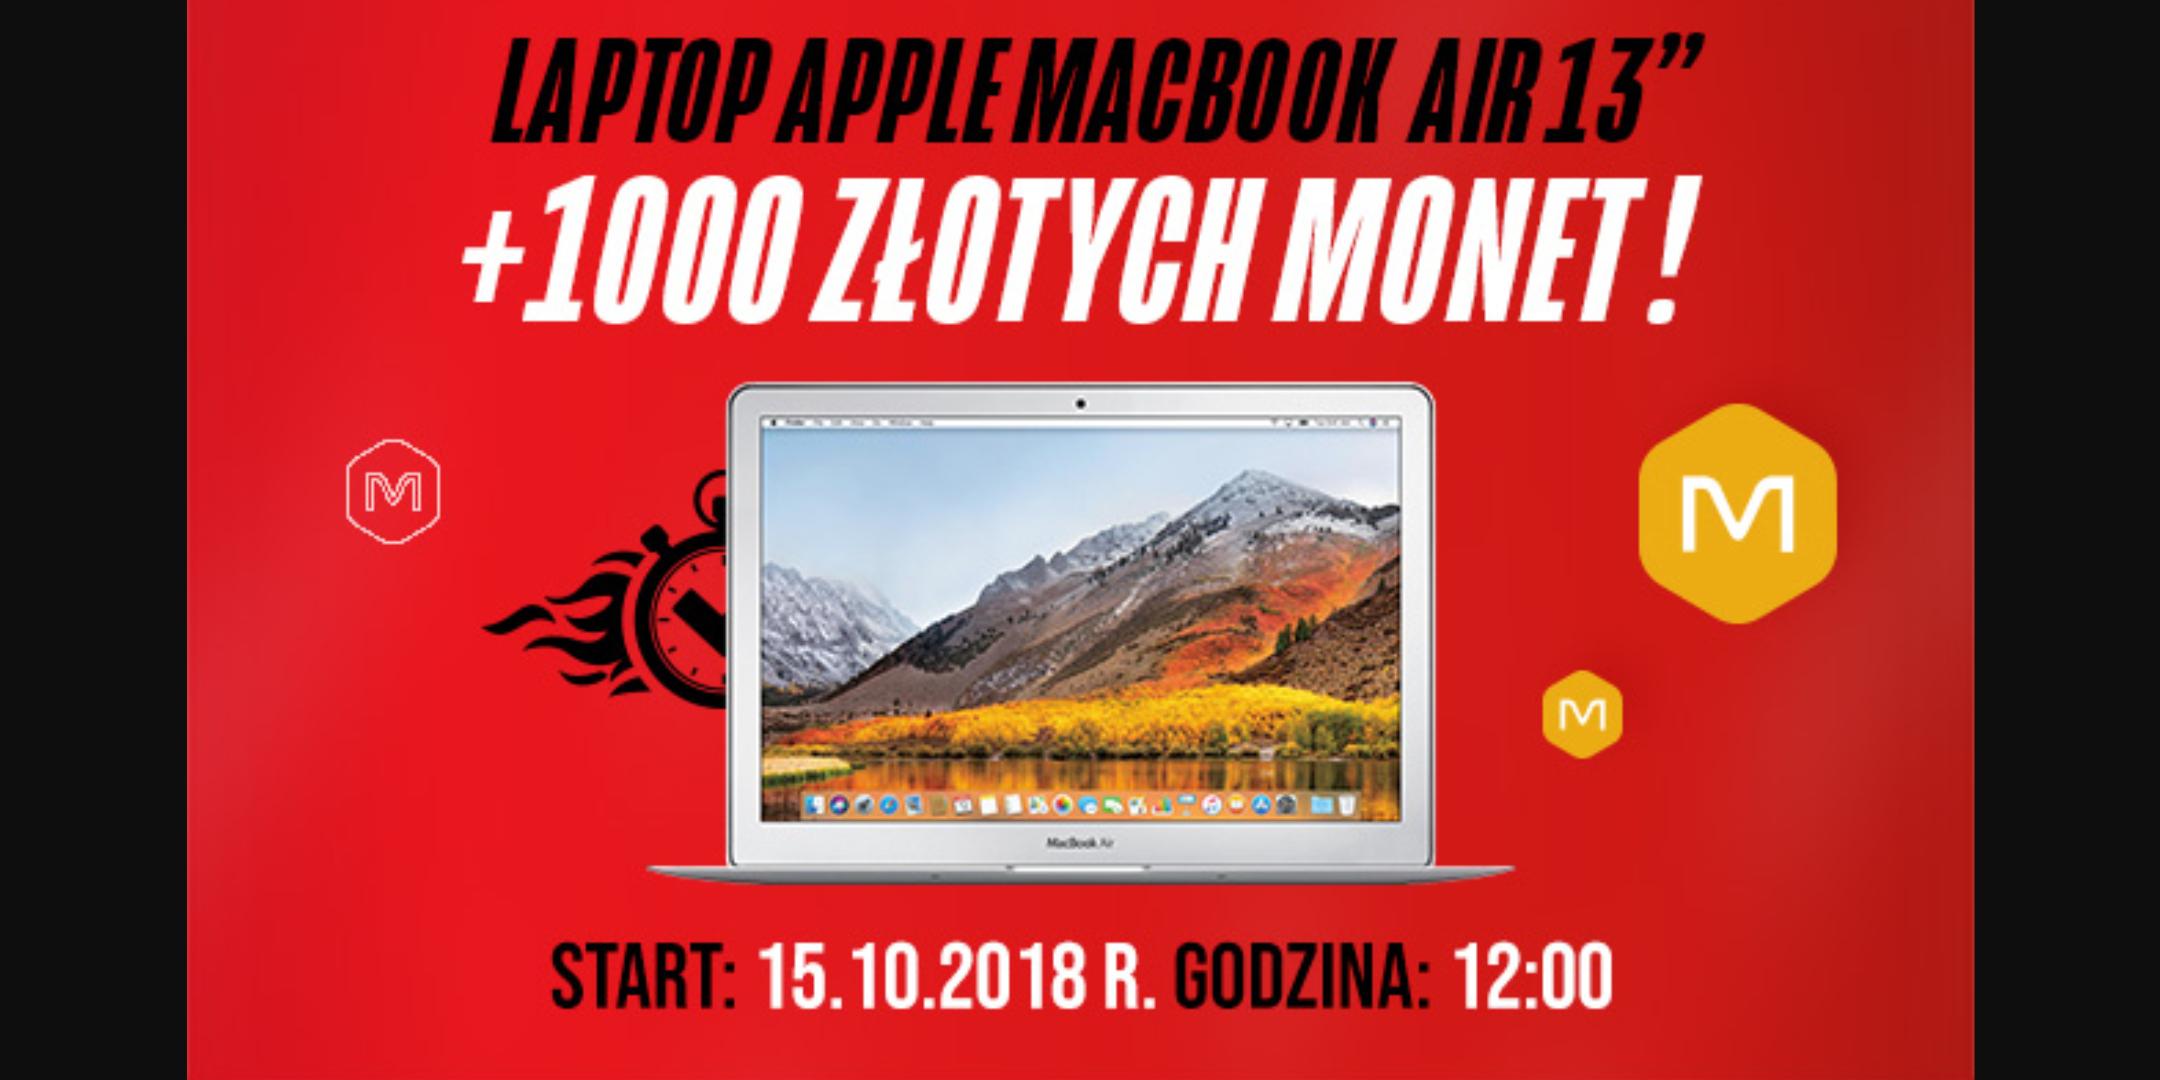 Apple MacBook Air MQD32ZE/A 13' w szybkich okazjach allegro! Start 15.10 godziny 12.00